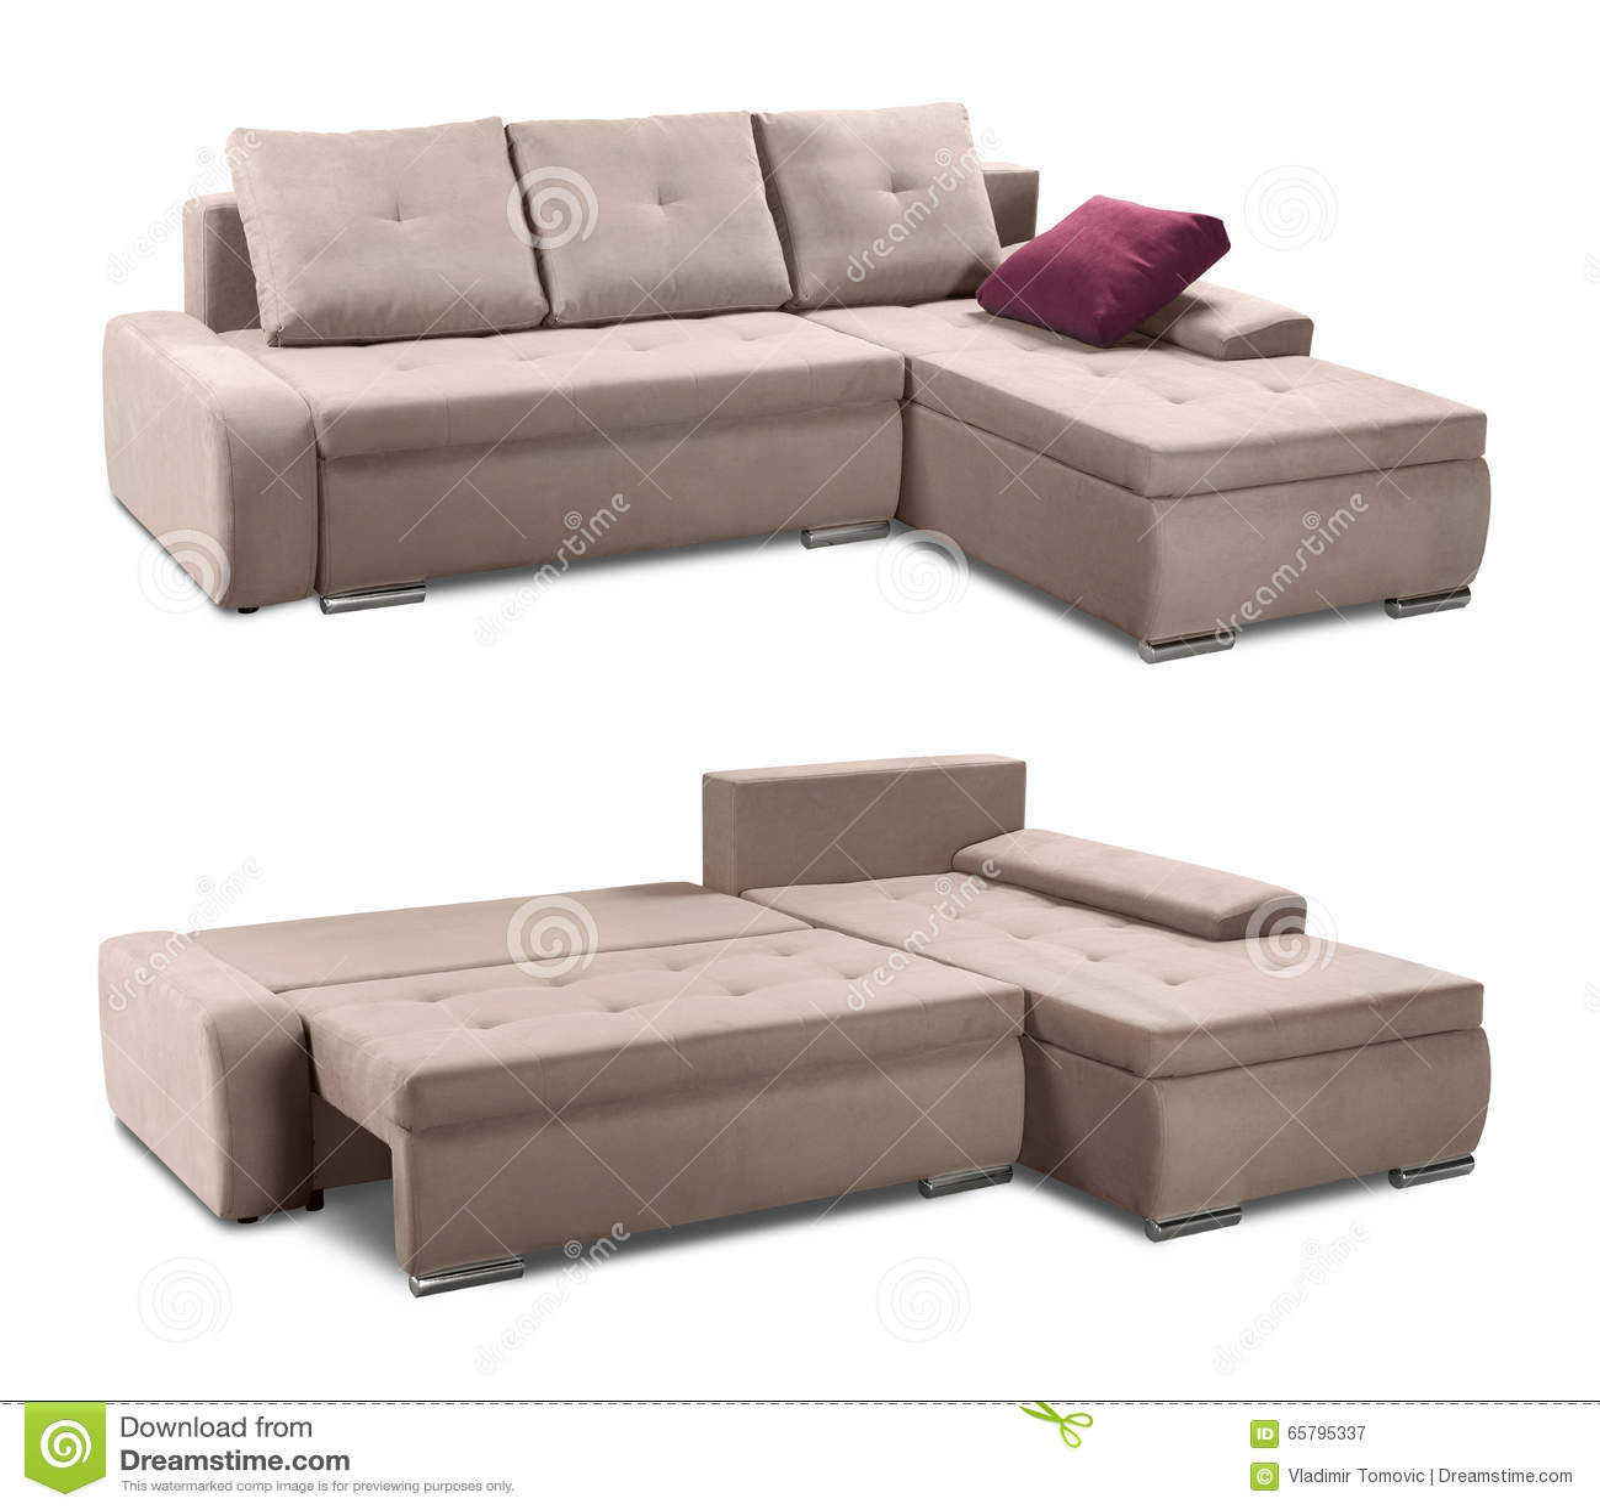 pillows on a sofa stock image